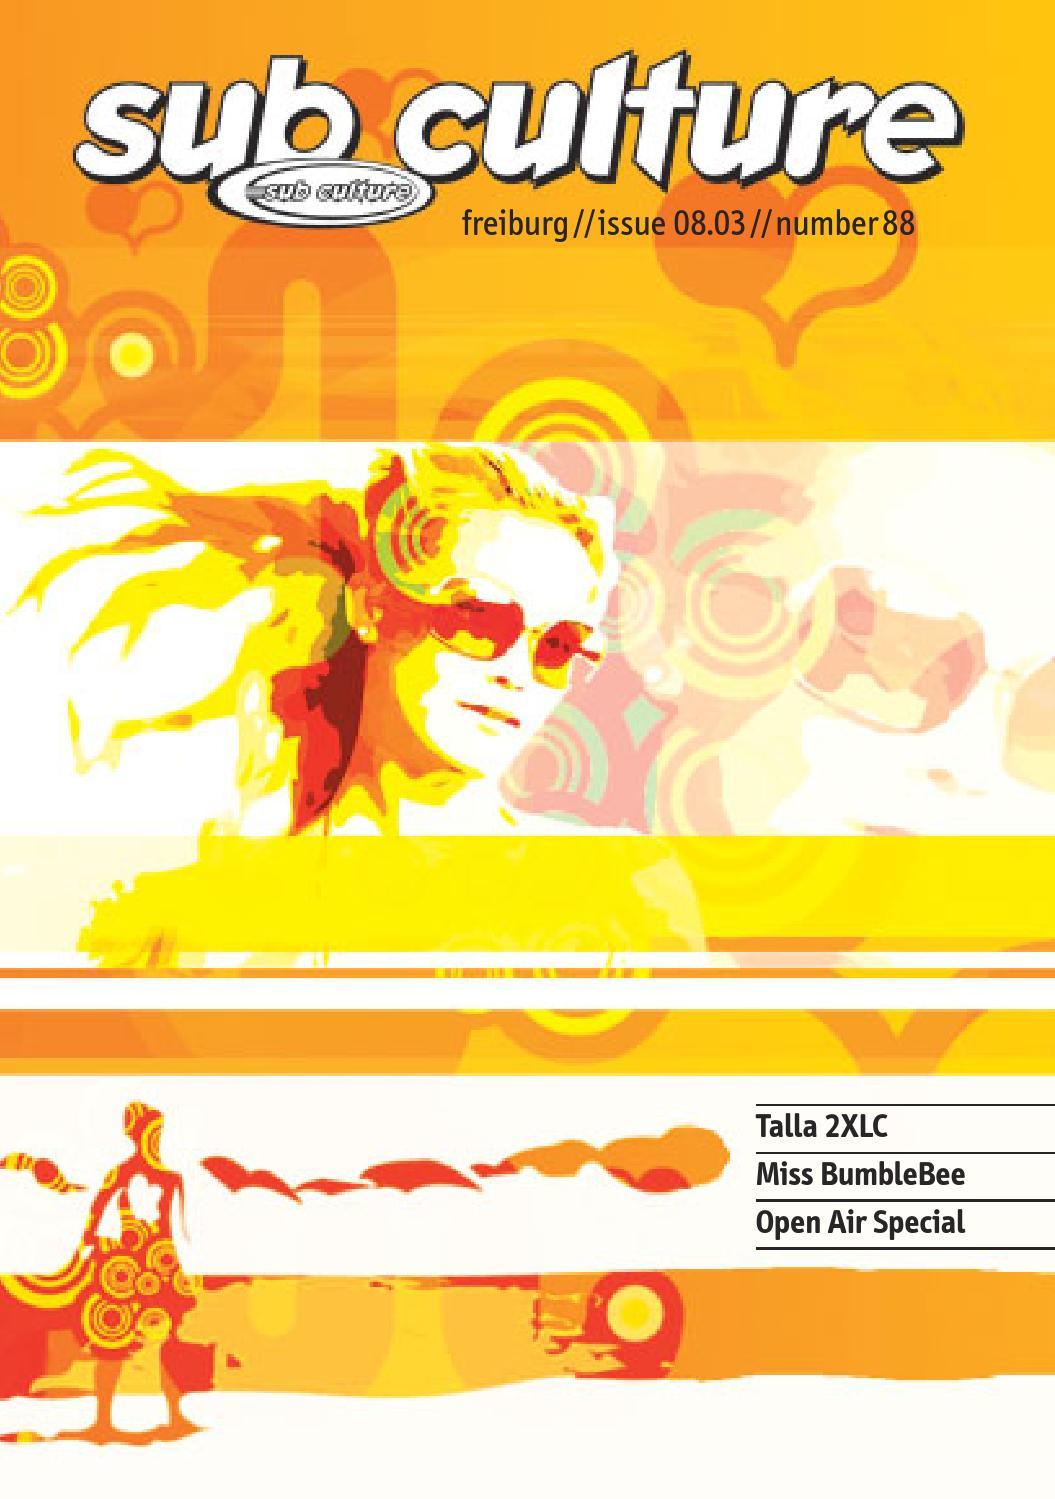 subculture-august-2003 by Thorsten Leucht - issuu